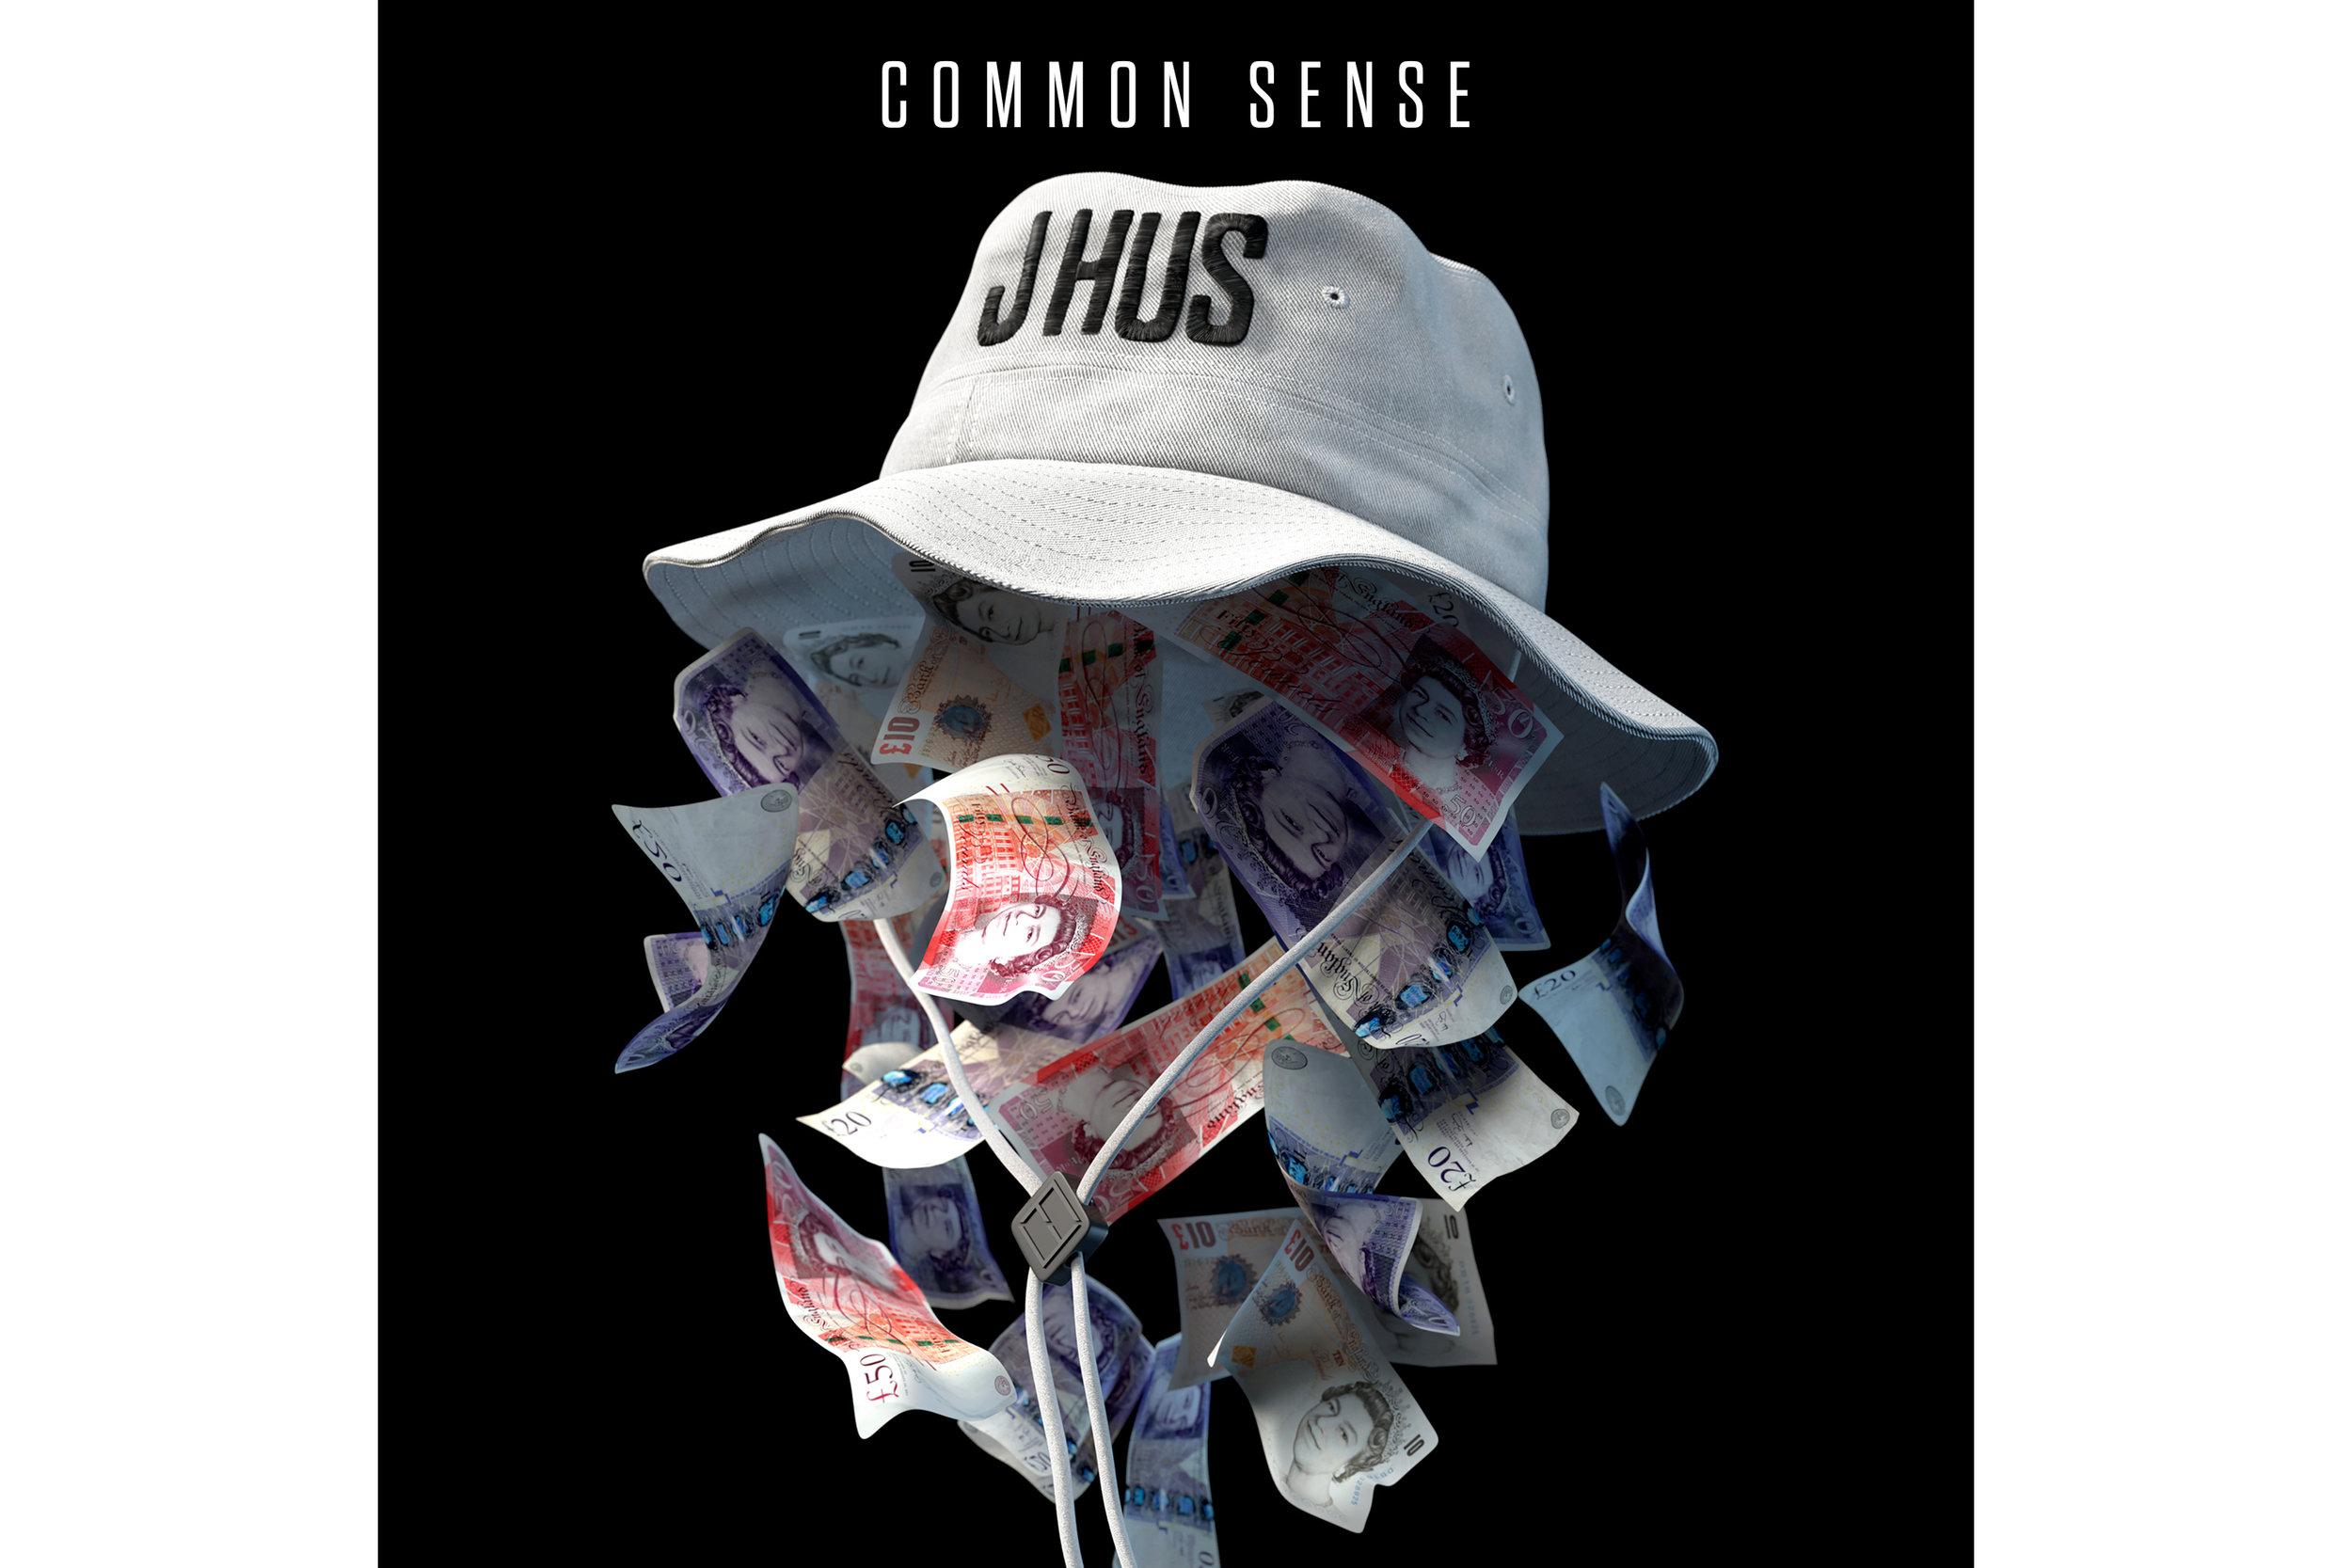 j hus common sense zip album